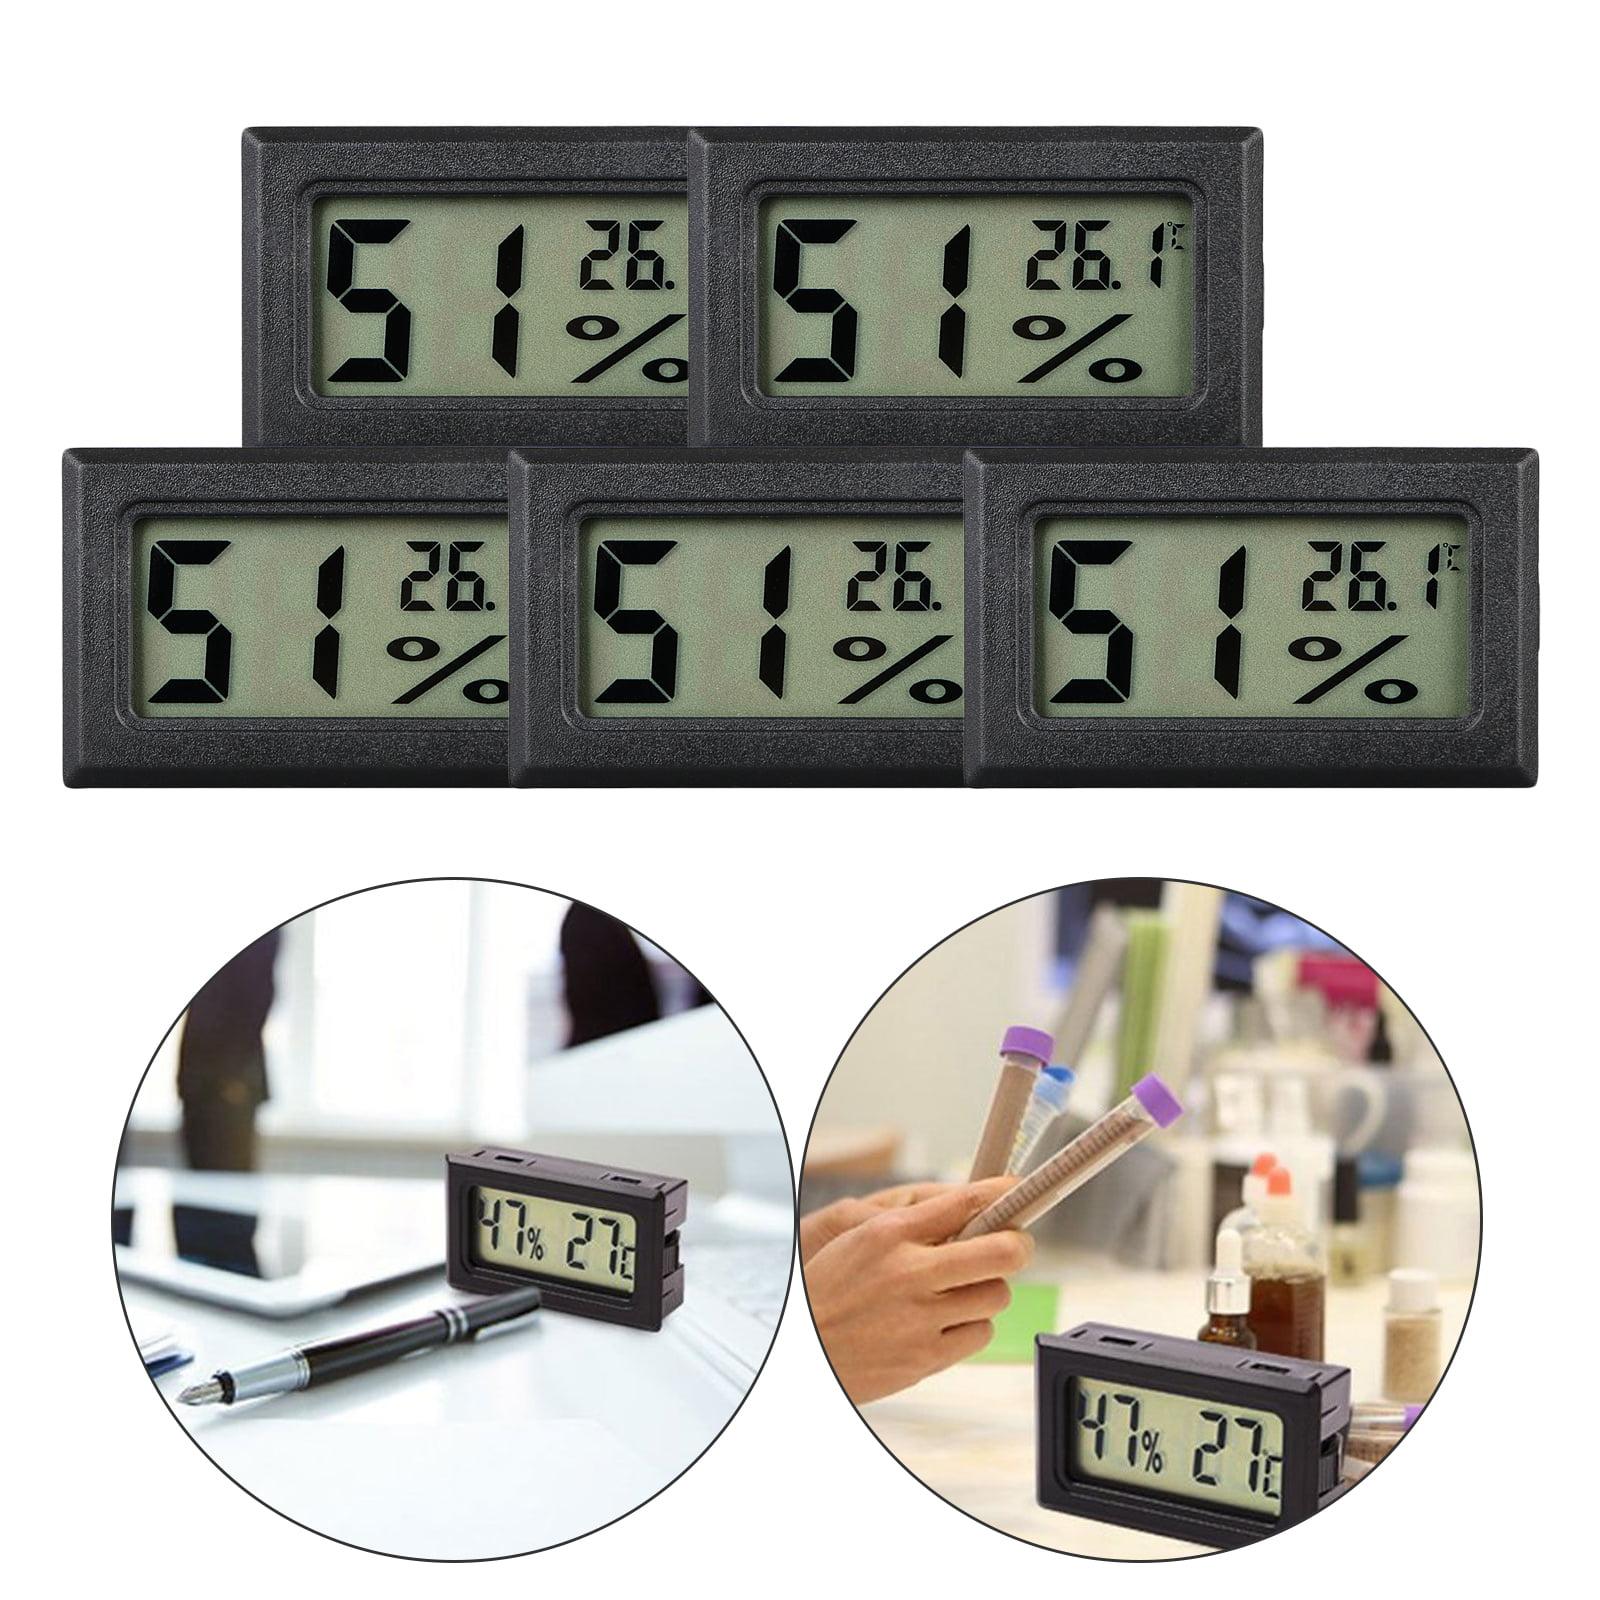 5 pieces Mini LCD Digital Indoor Temperature Humidity Meter Thermomètre Hygromètre